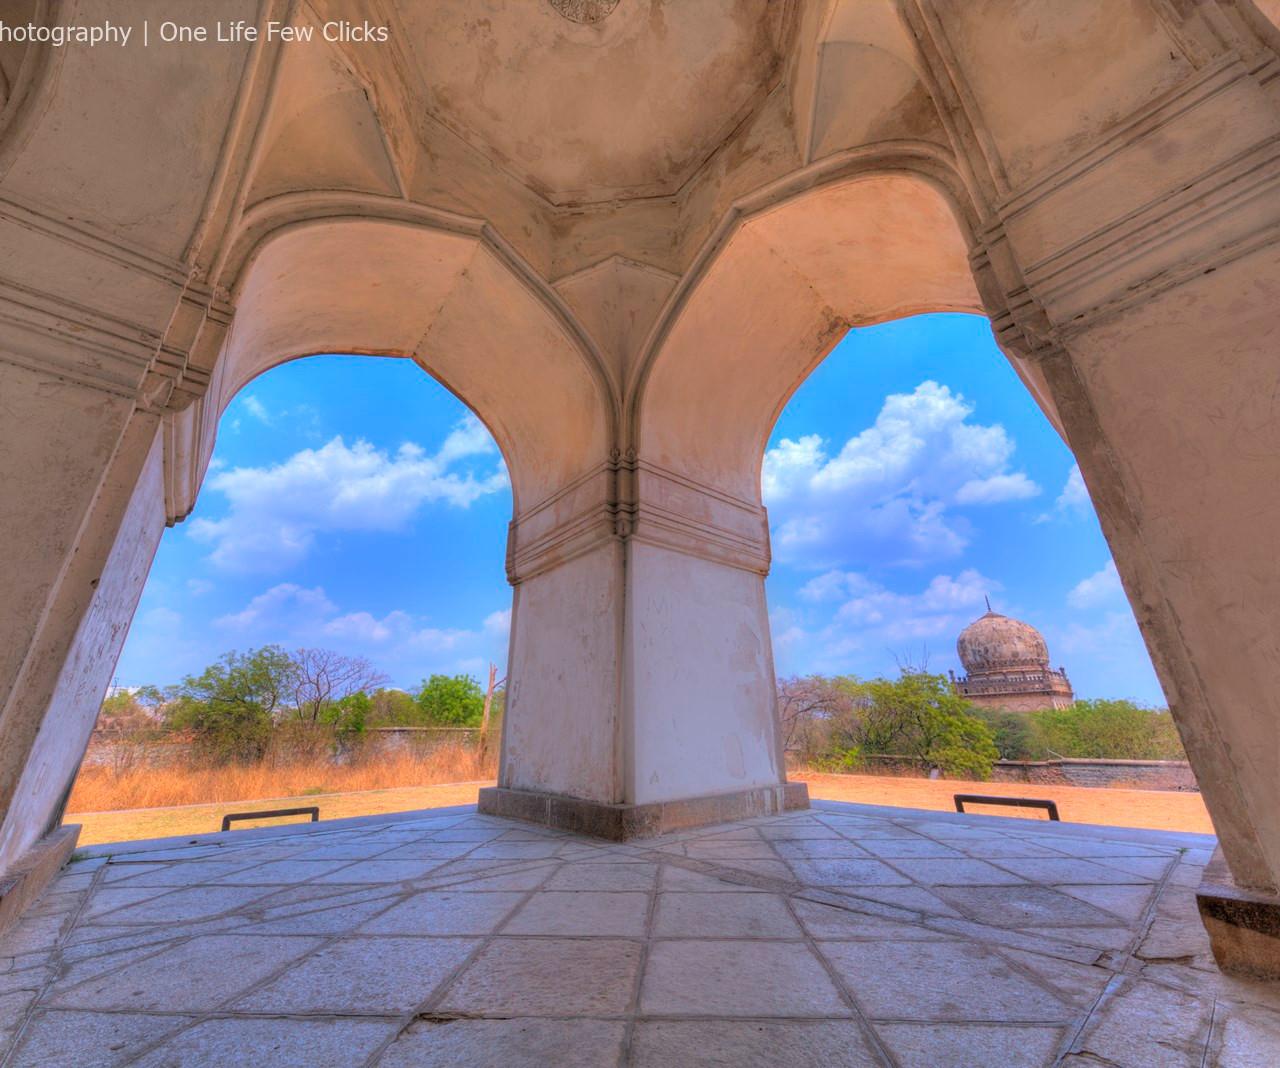 Qutb Shahi Tombs | Dhritiman Lahiri